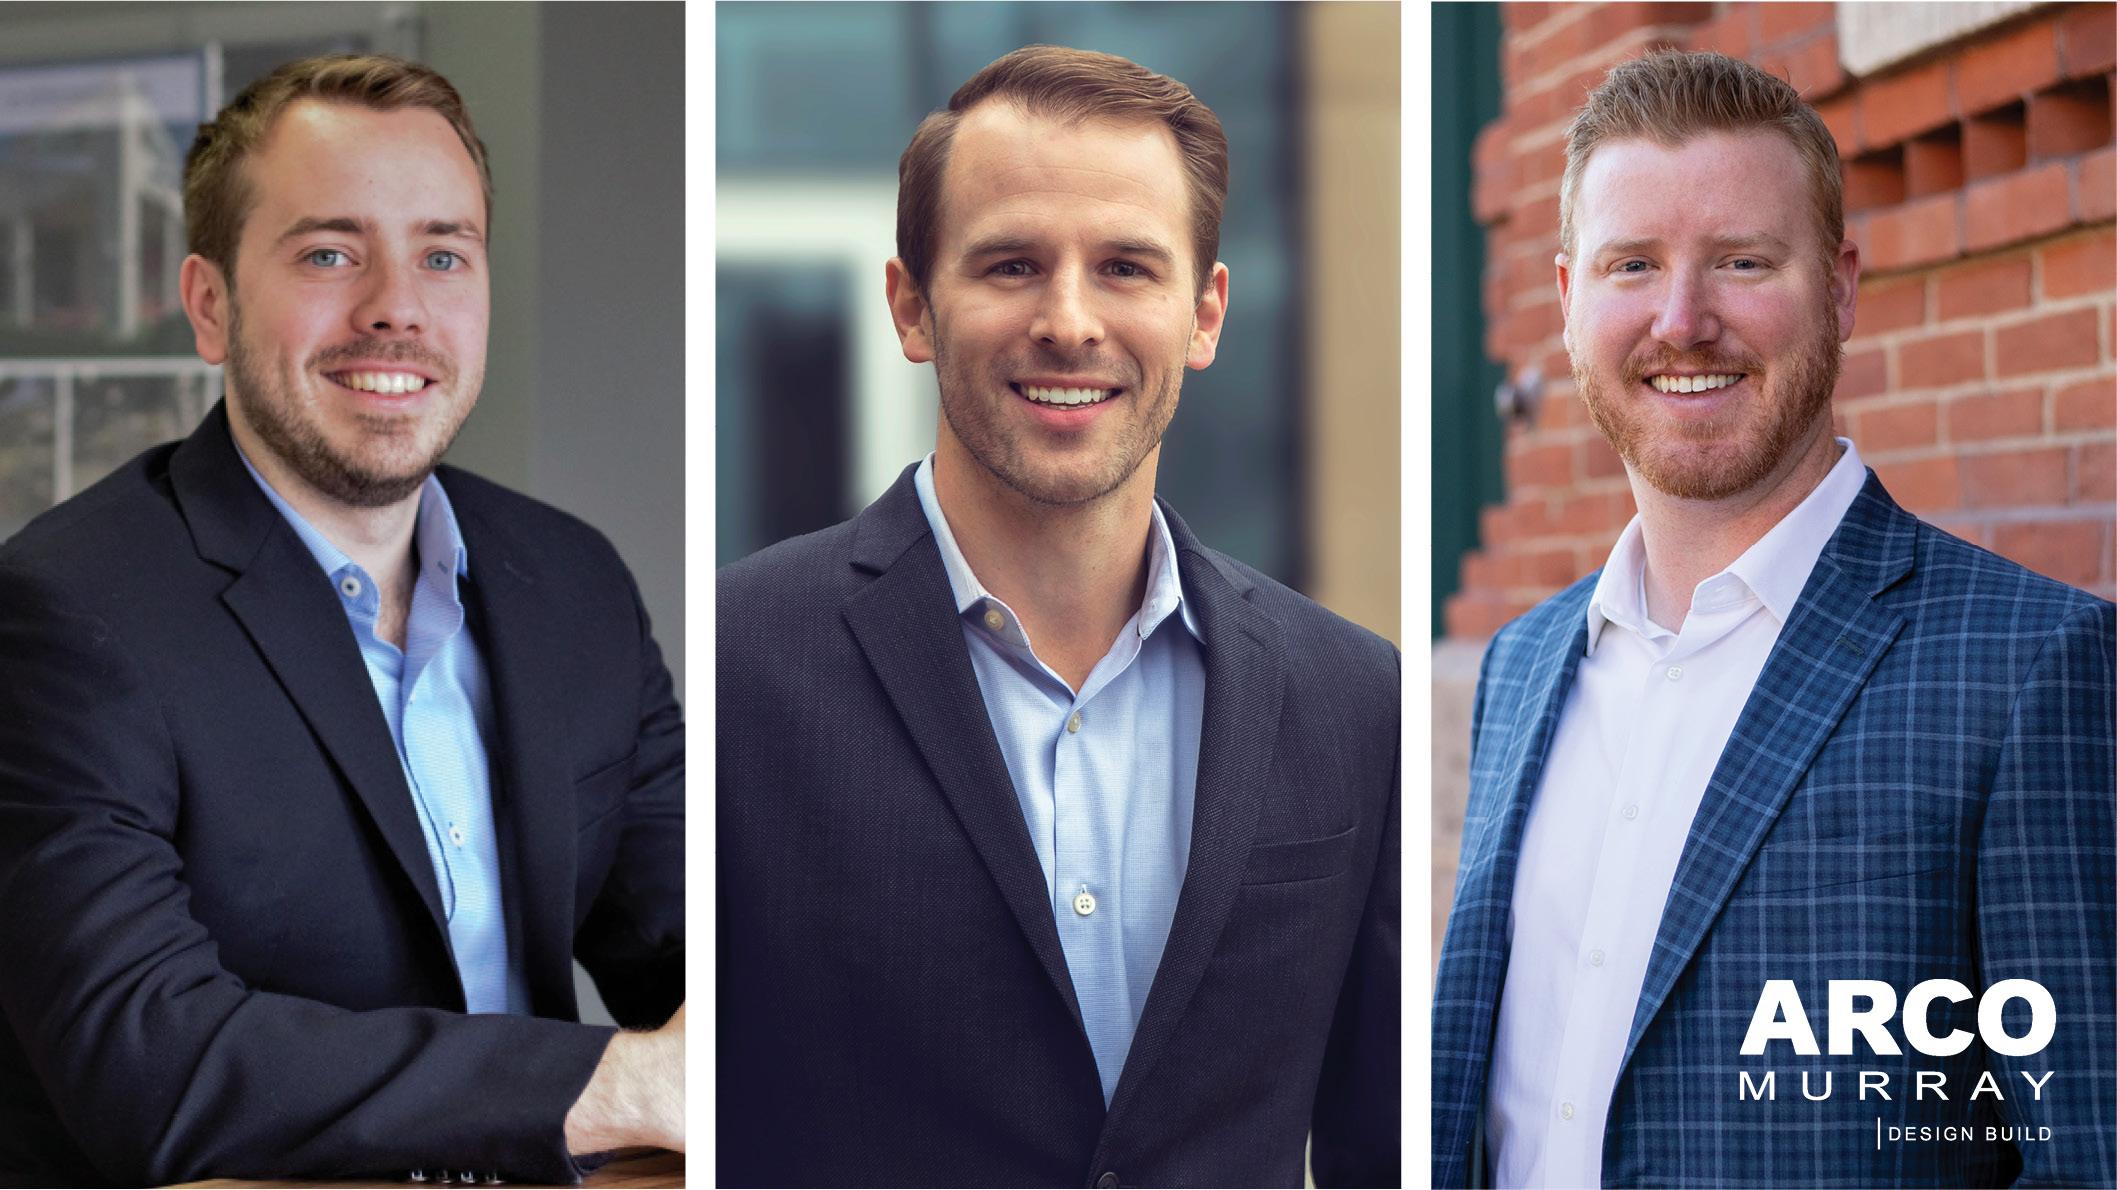 ARCO/Murray Names Colin Epperson, Brett Garrett, and Jeff Meissner Partners